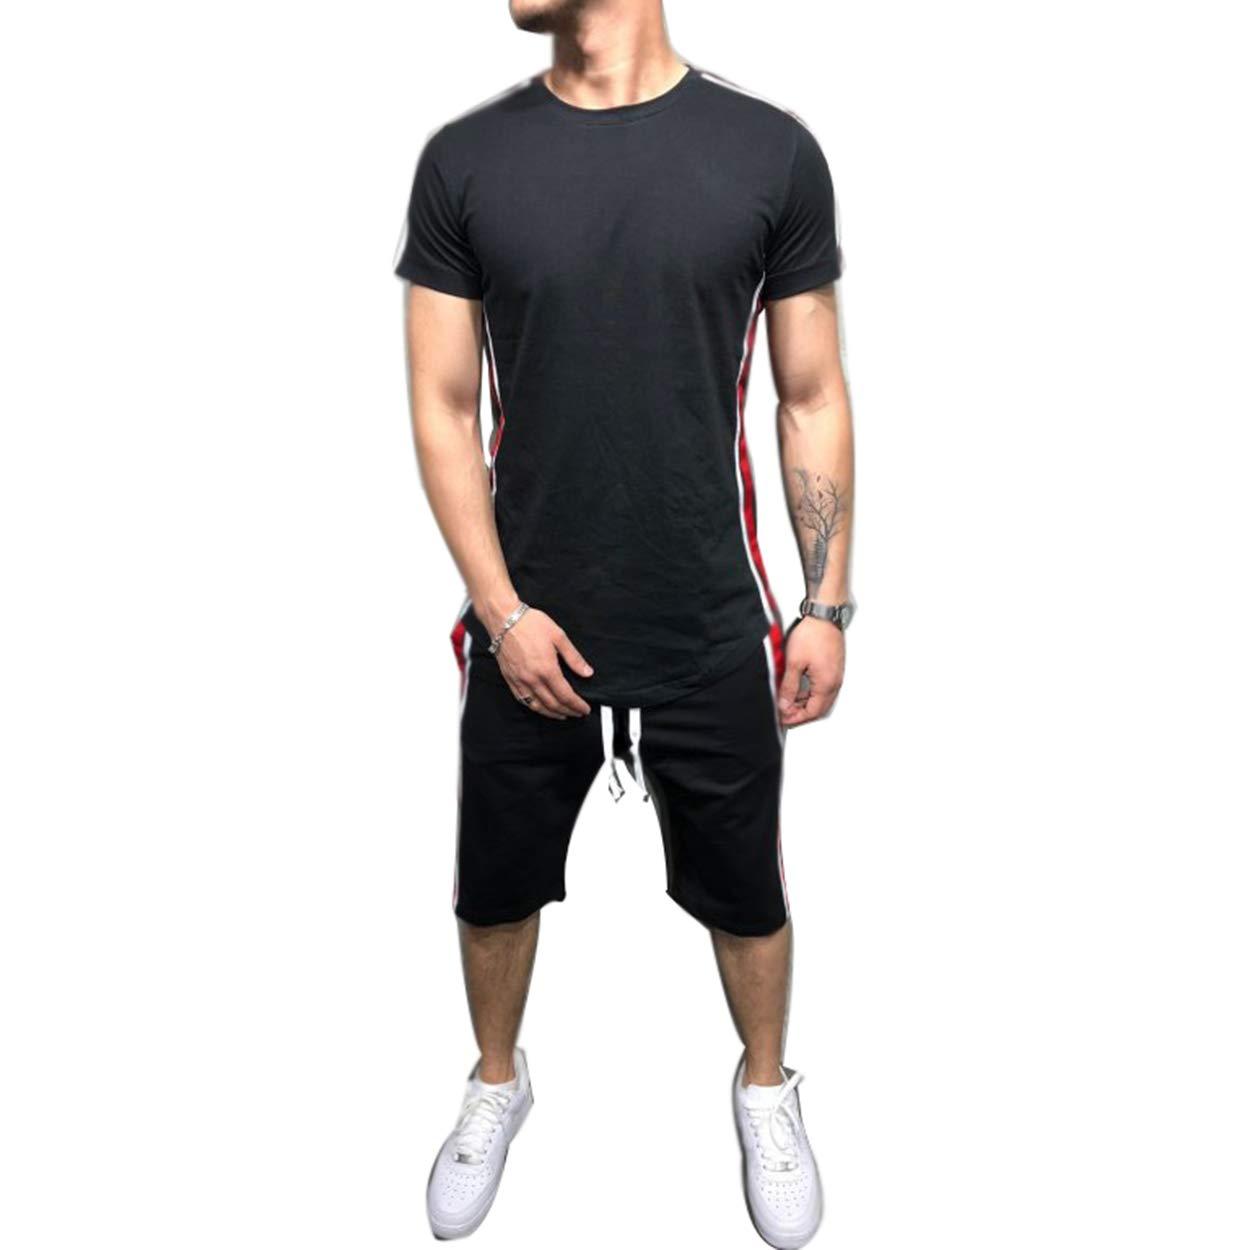 Swim Shirt Trunks Suit Set AMILIEe Surf Mens Short Sleeve Rashguard UPF 50